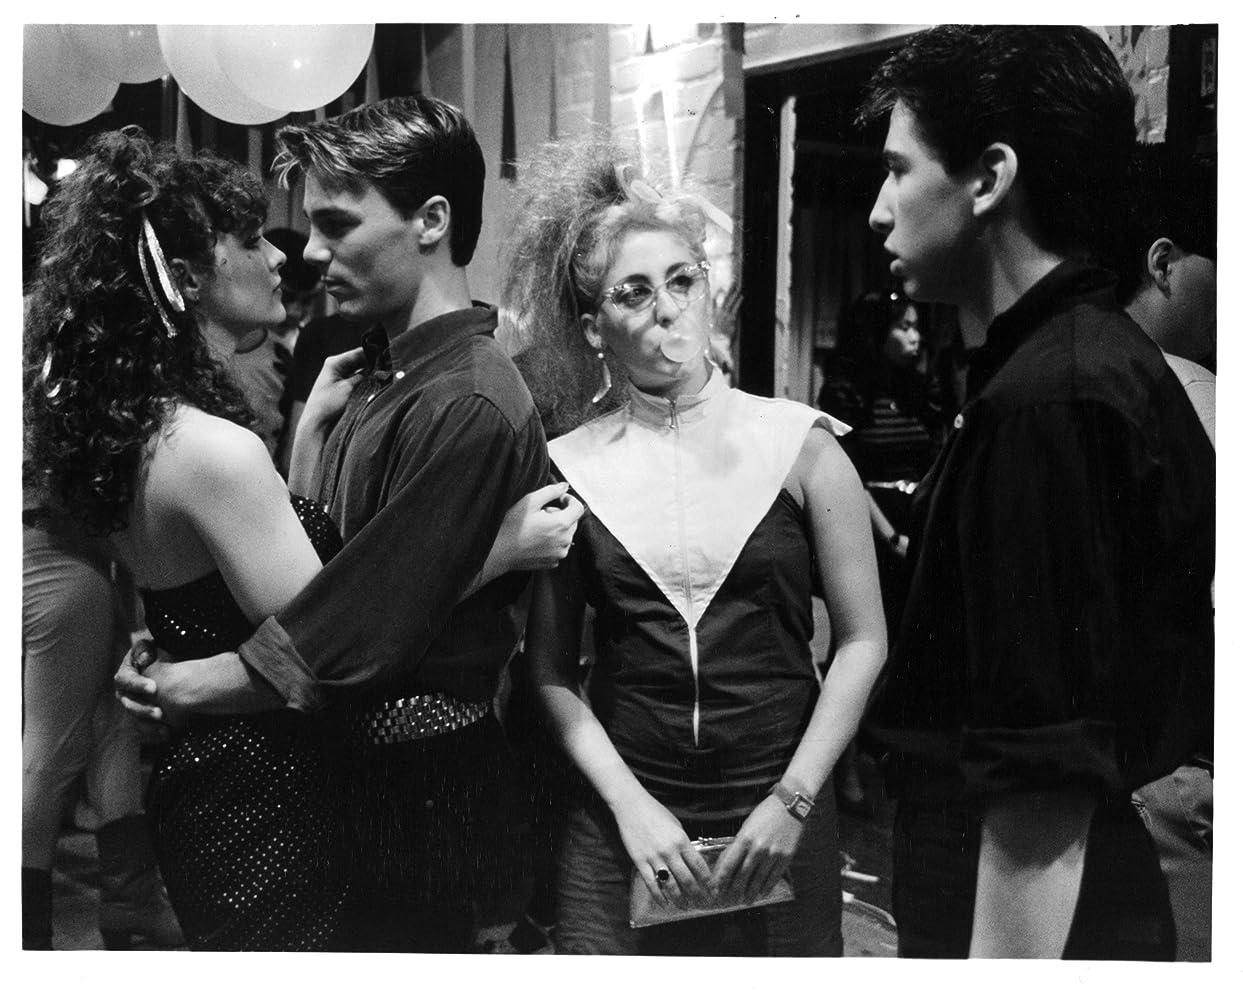 Sylvia Jefferies,Nicole Leach Hot movies Vivian Pickles (born 1931),Skyler Samuels